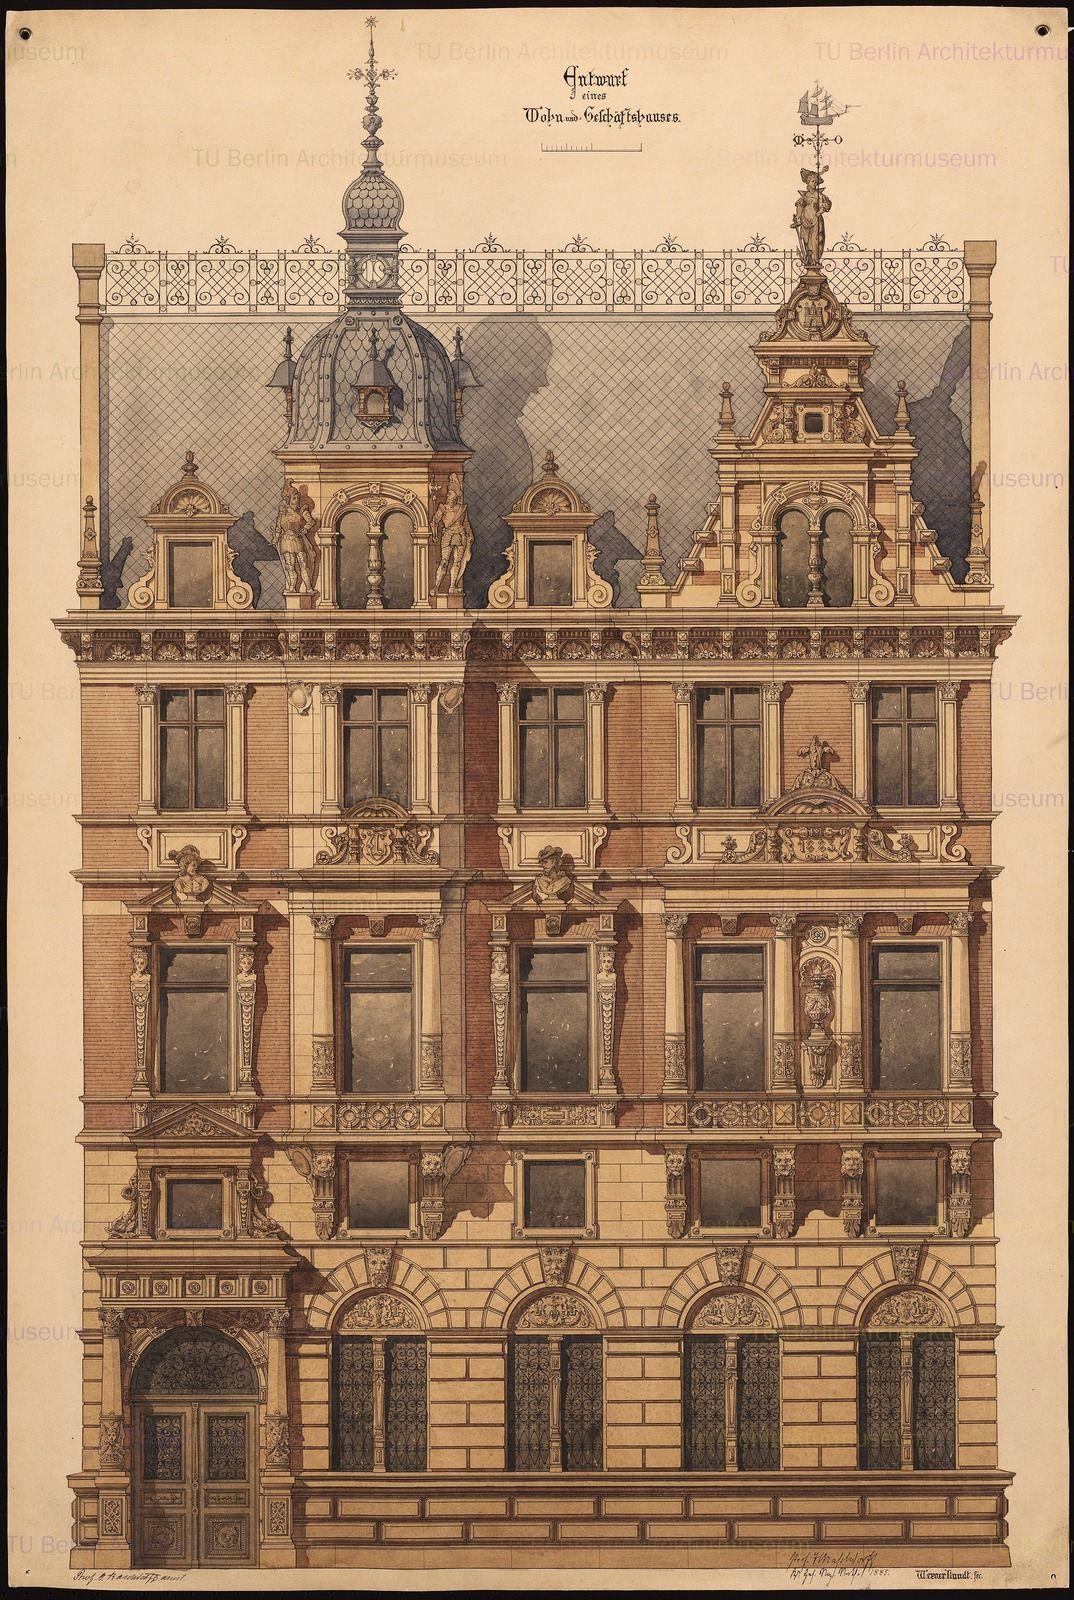 Wohn Und Geschaftshaus Edificios Antiguos Dibujo De Arquitectura Fachadas Edificios